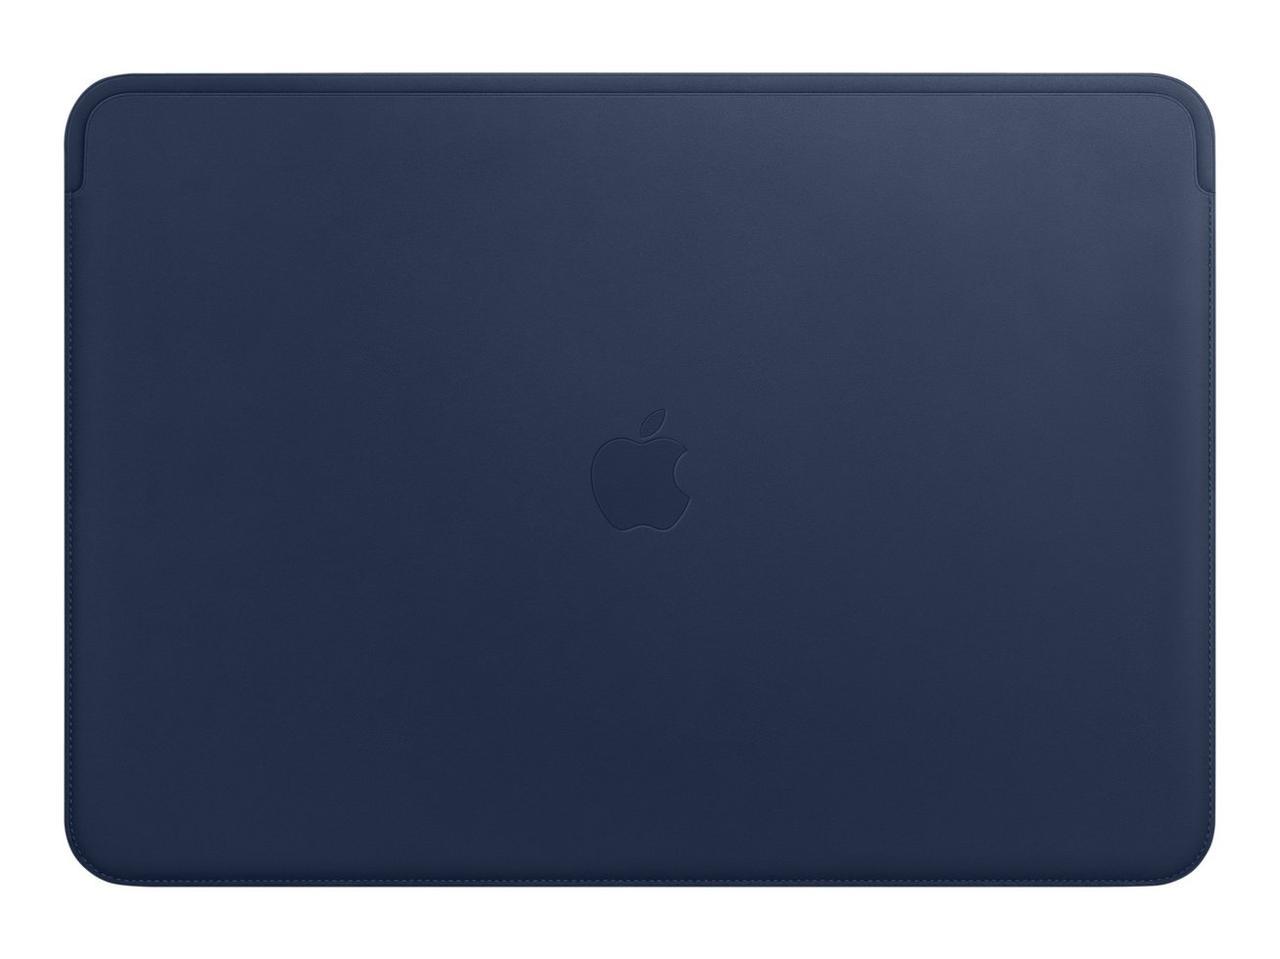 "Чехол для MacBook 15"" Apple Leather Sleeve, тёмно-синий (MRQU2ZM/A)"